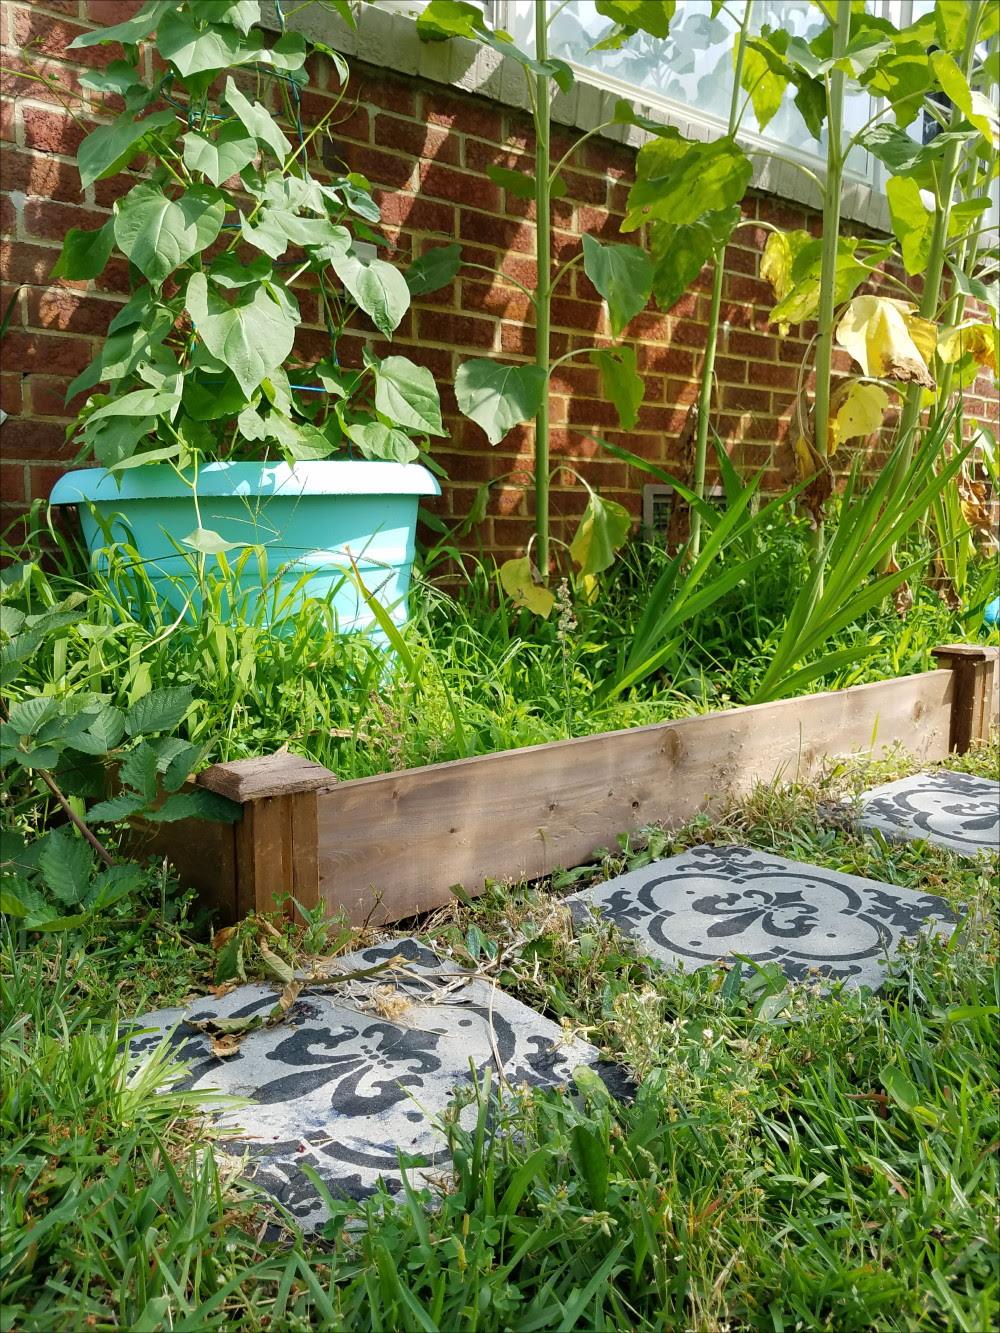 Encaustic tile look alike yard pavers and customized raised garden bed kit. Aqua yard details - @adesignerathome